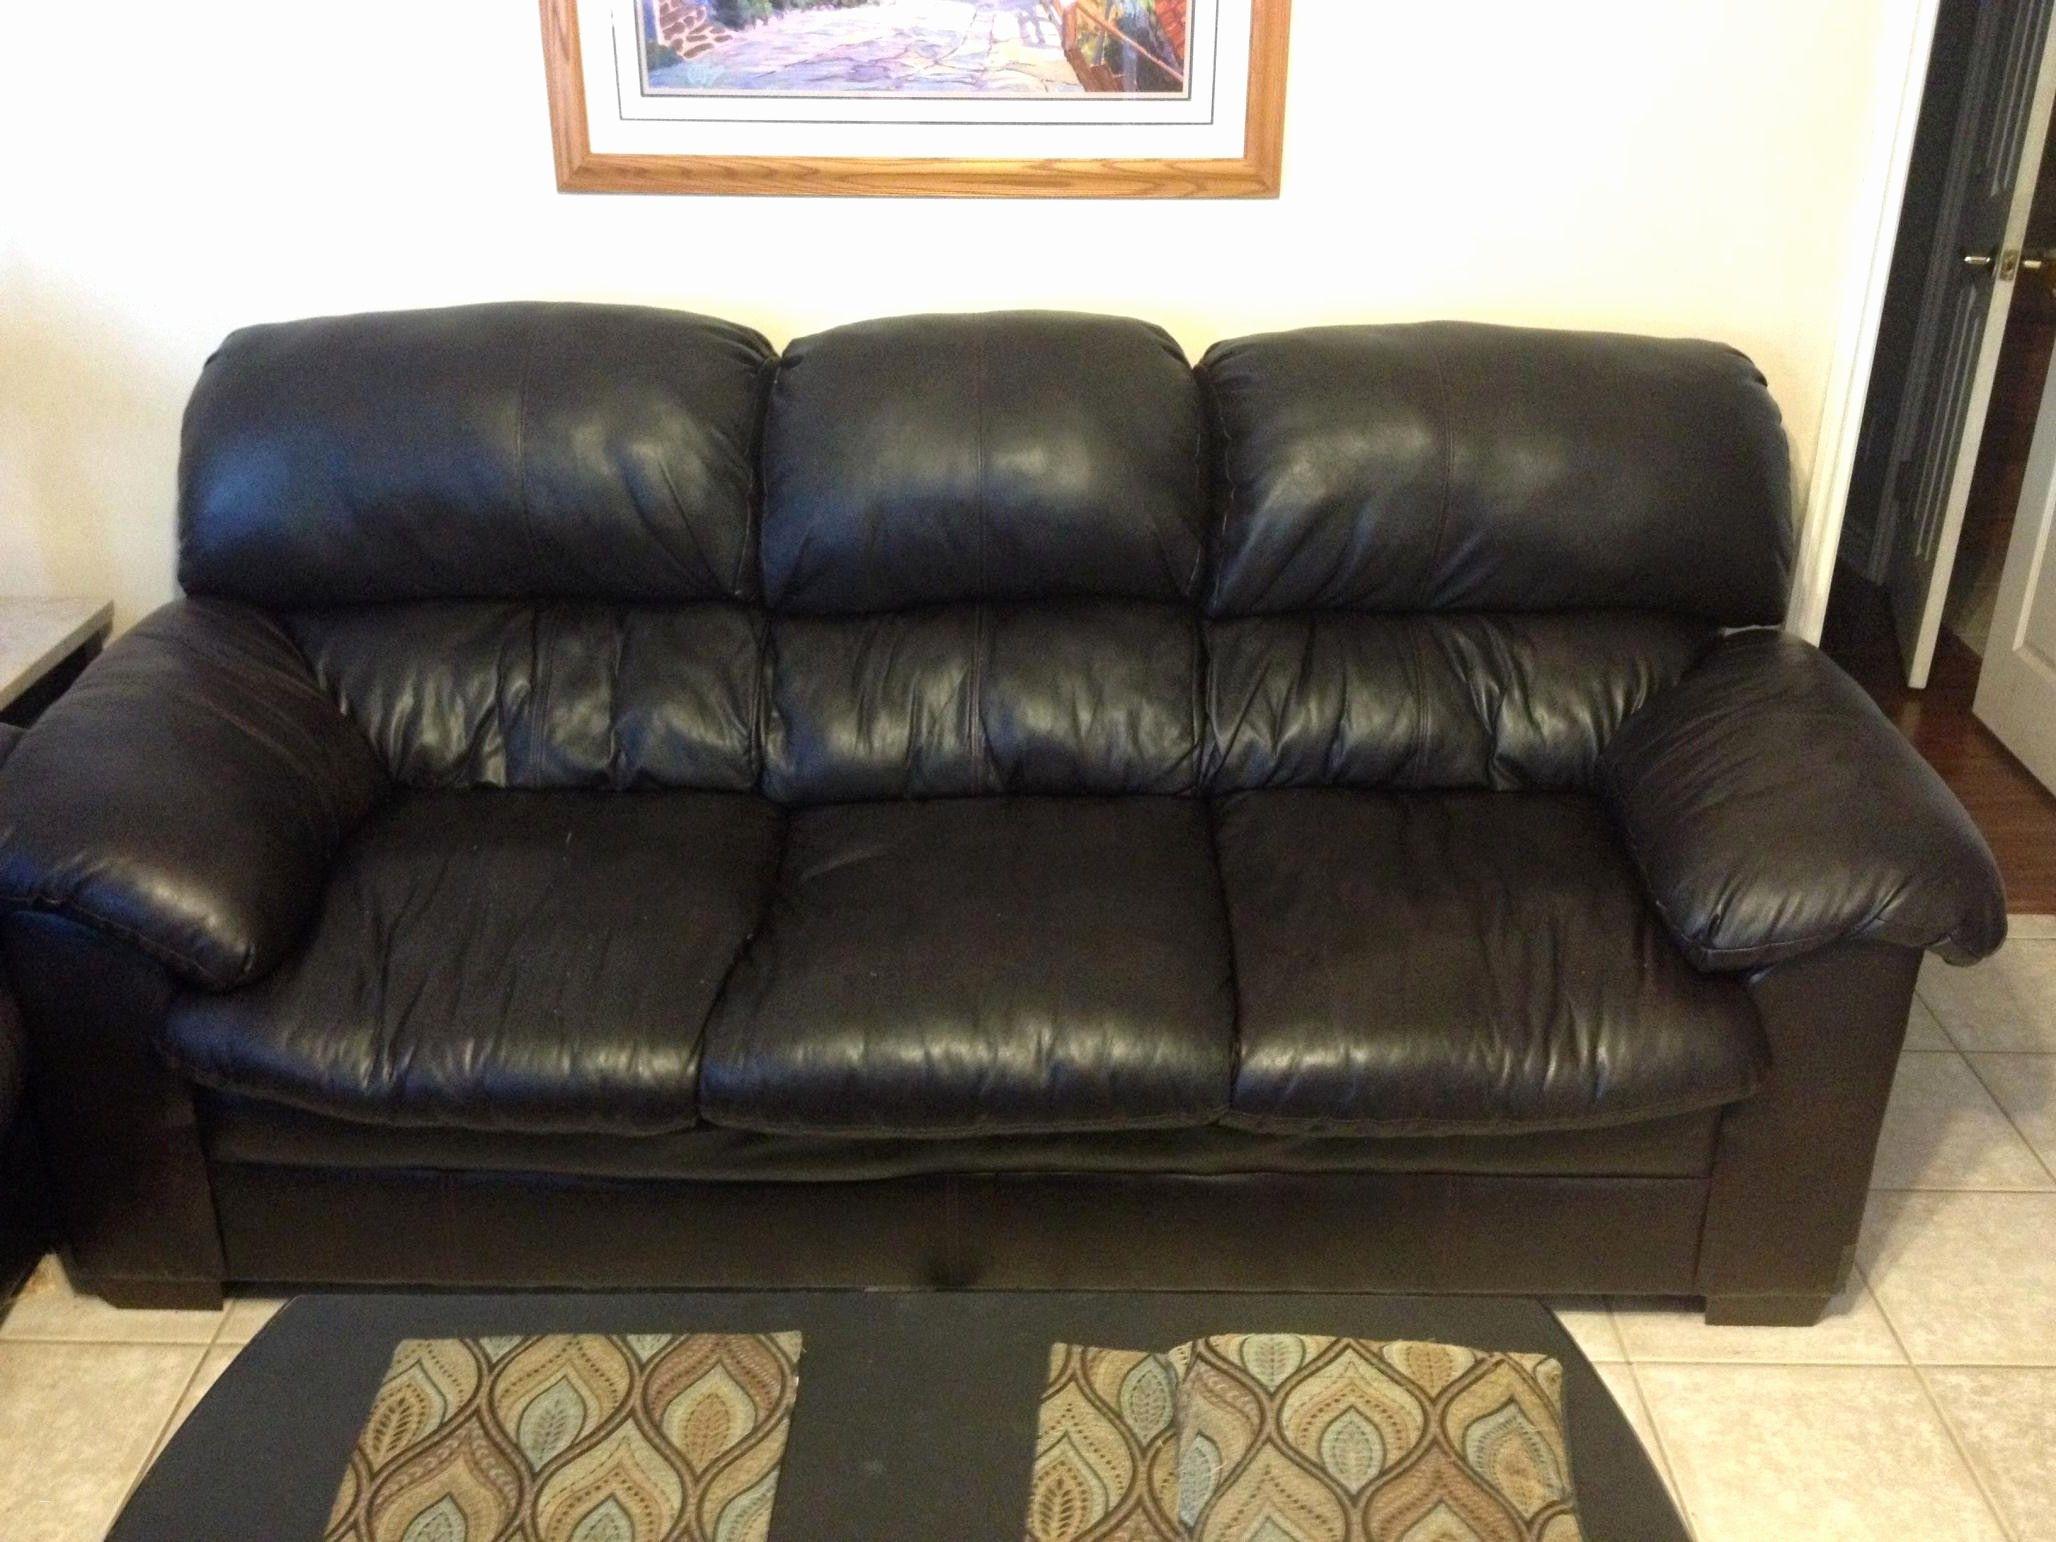 26 Best Of Billig Sectional Sofas Nashville Tn Sofa Design Couch Mobel Sofa